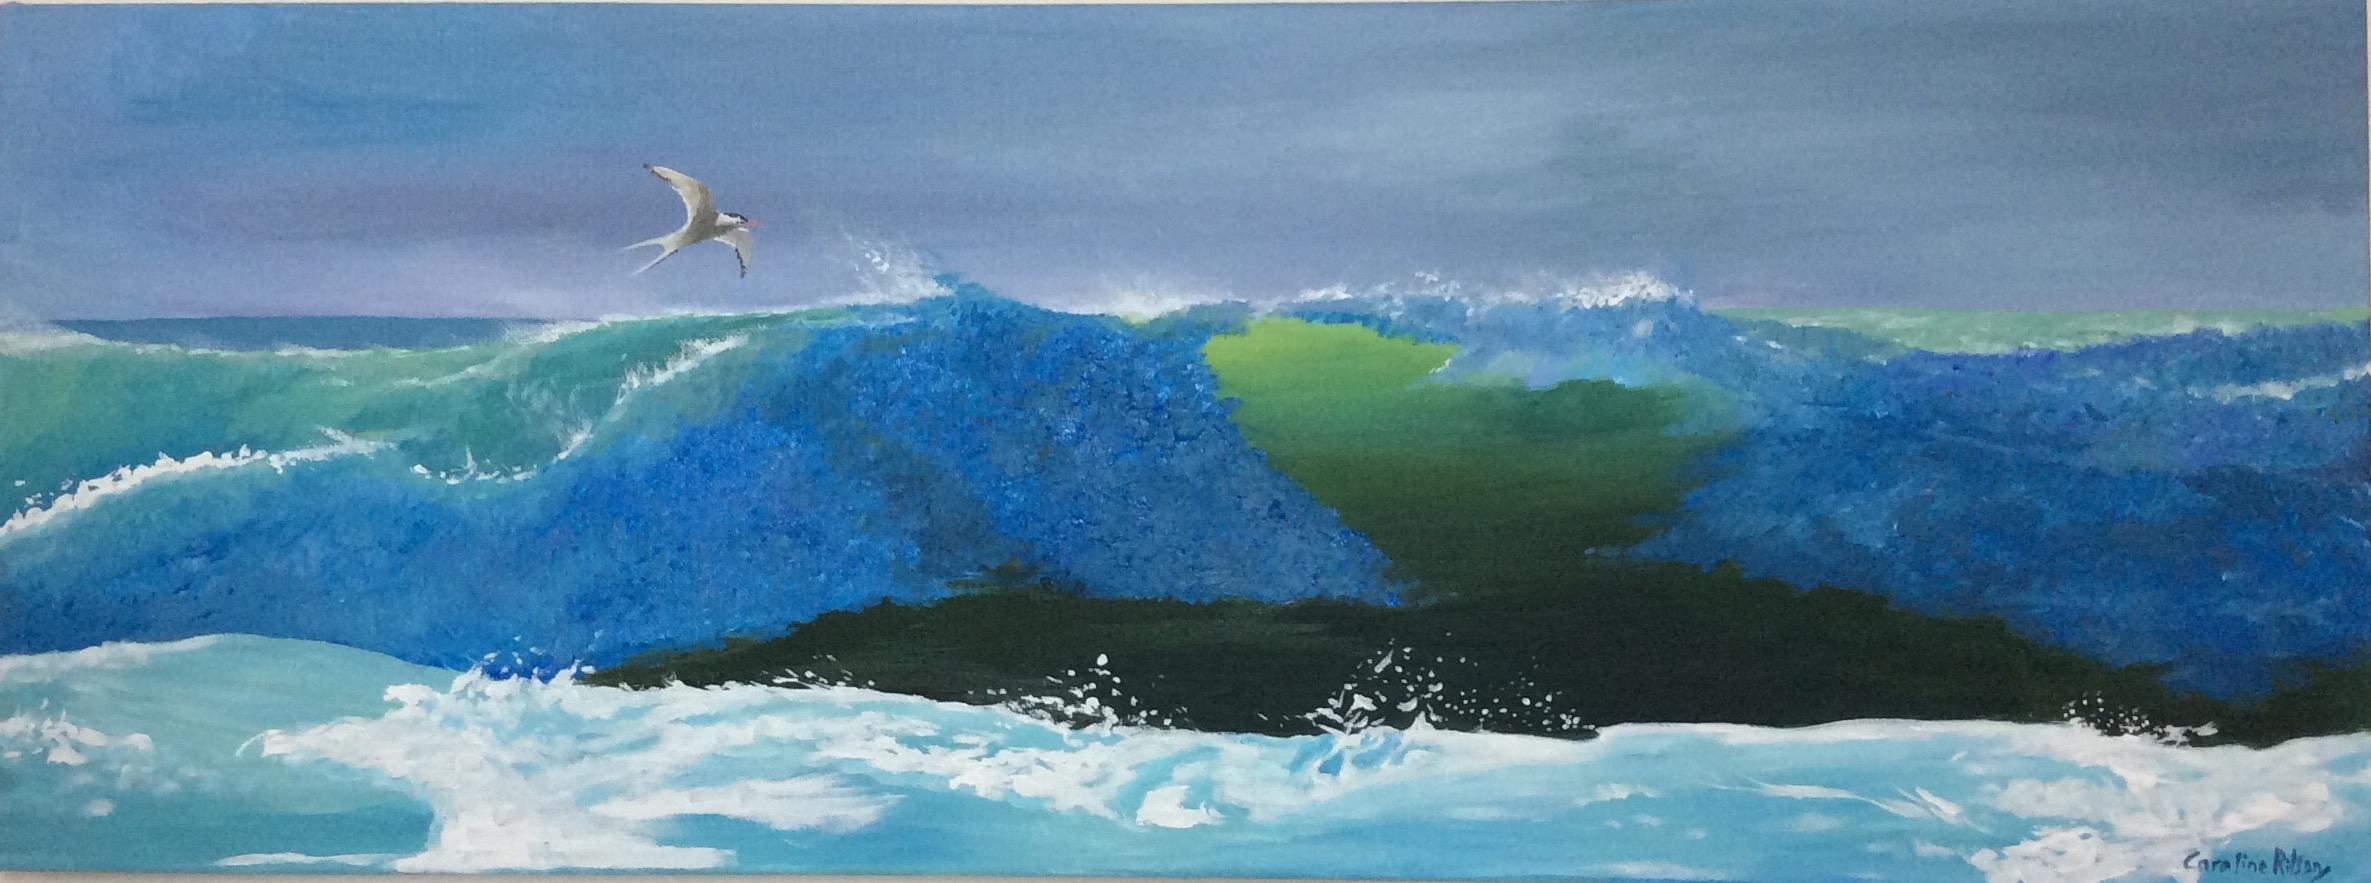 Tern seascape